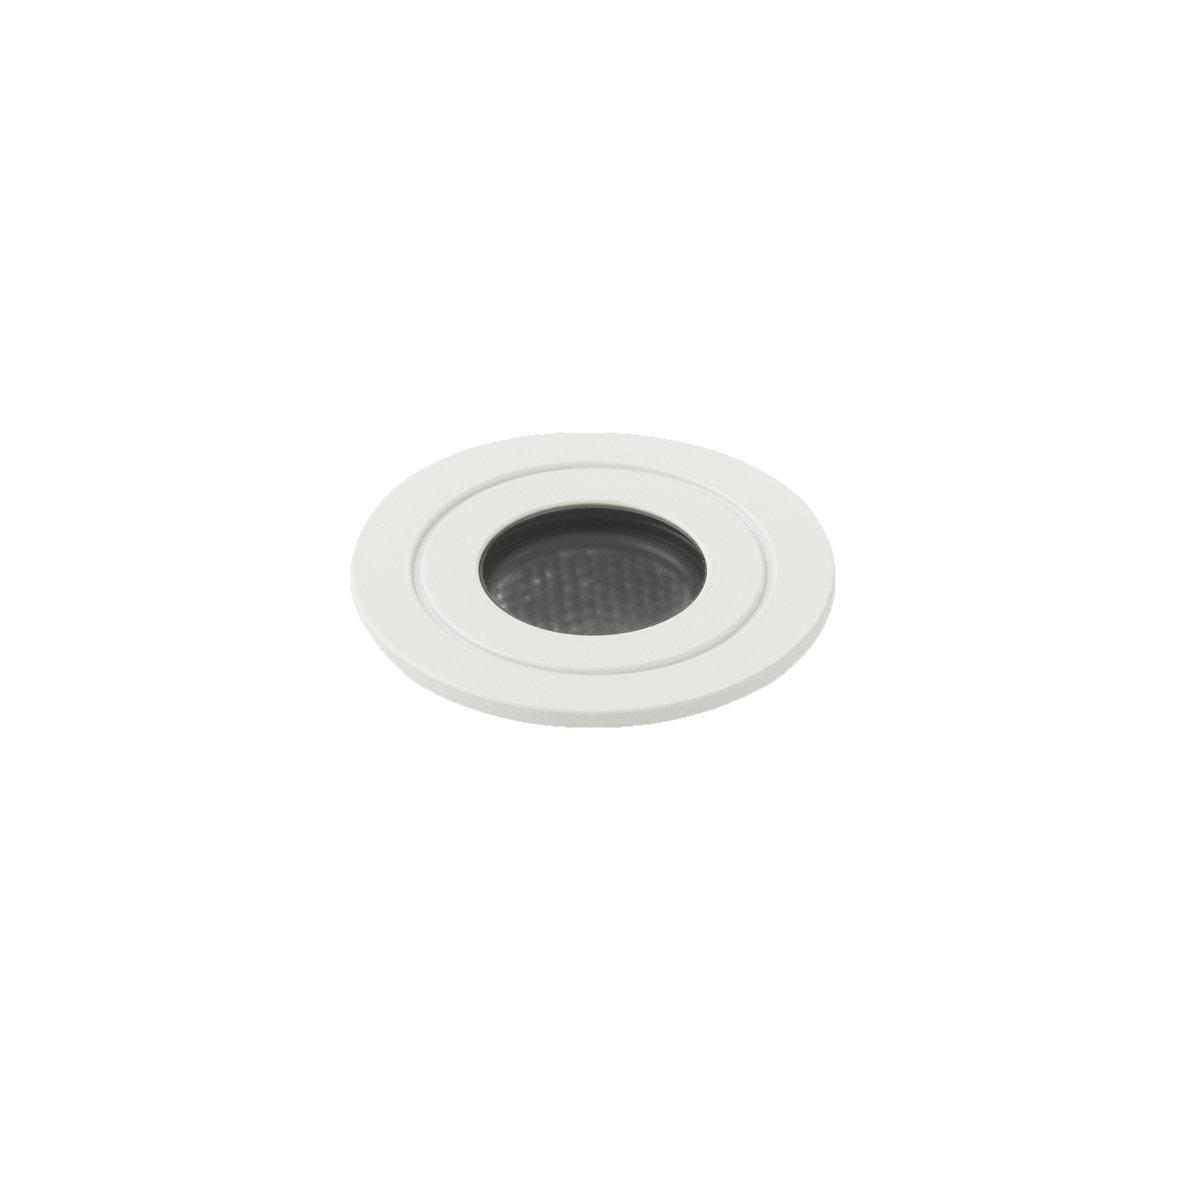 Luccini Miniature Uplight main image